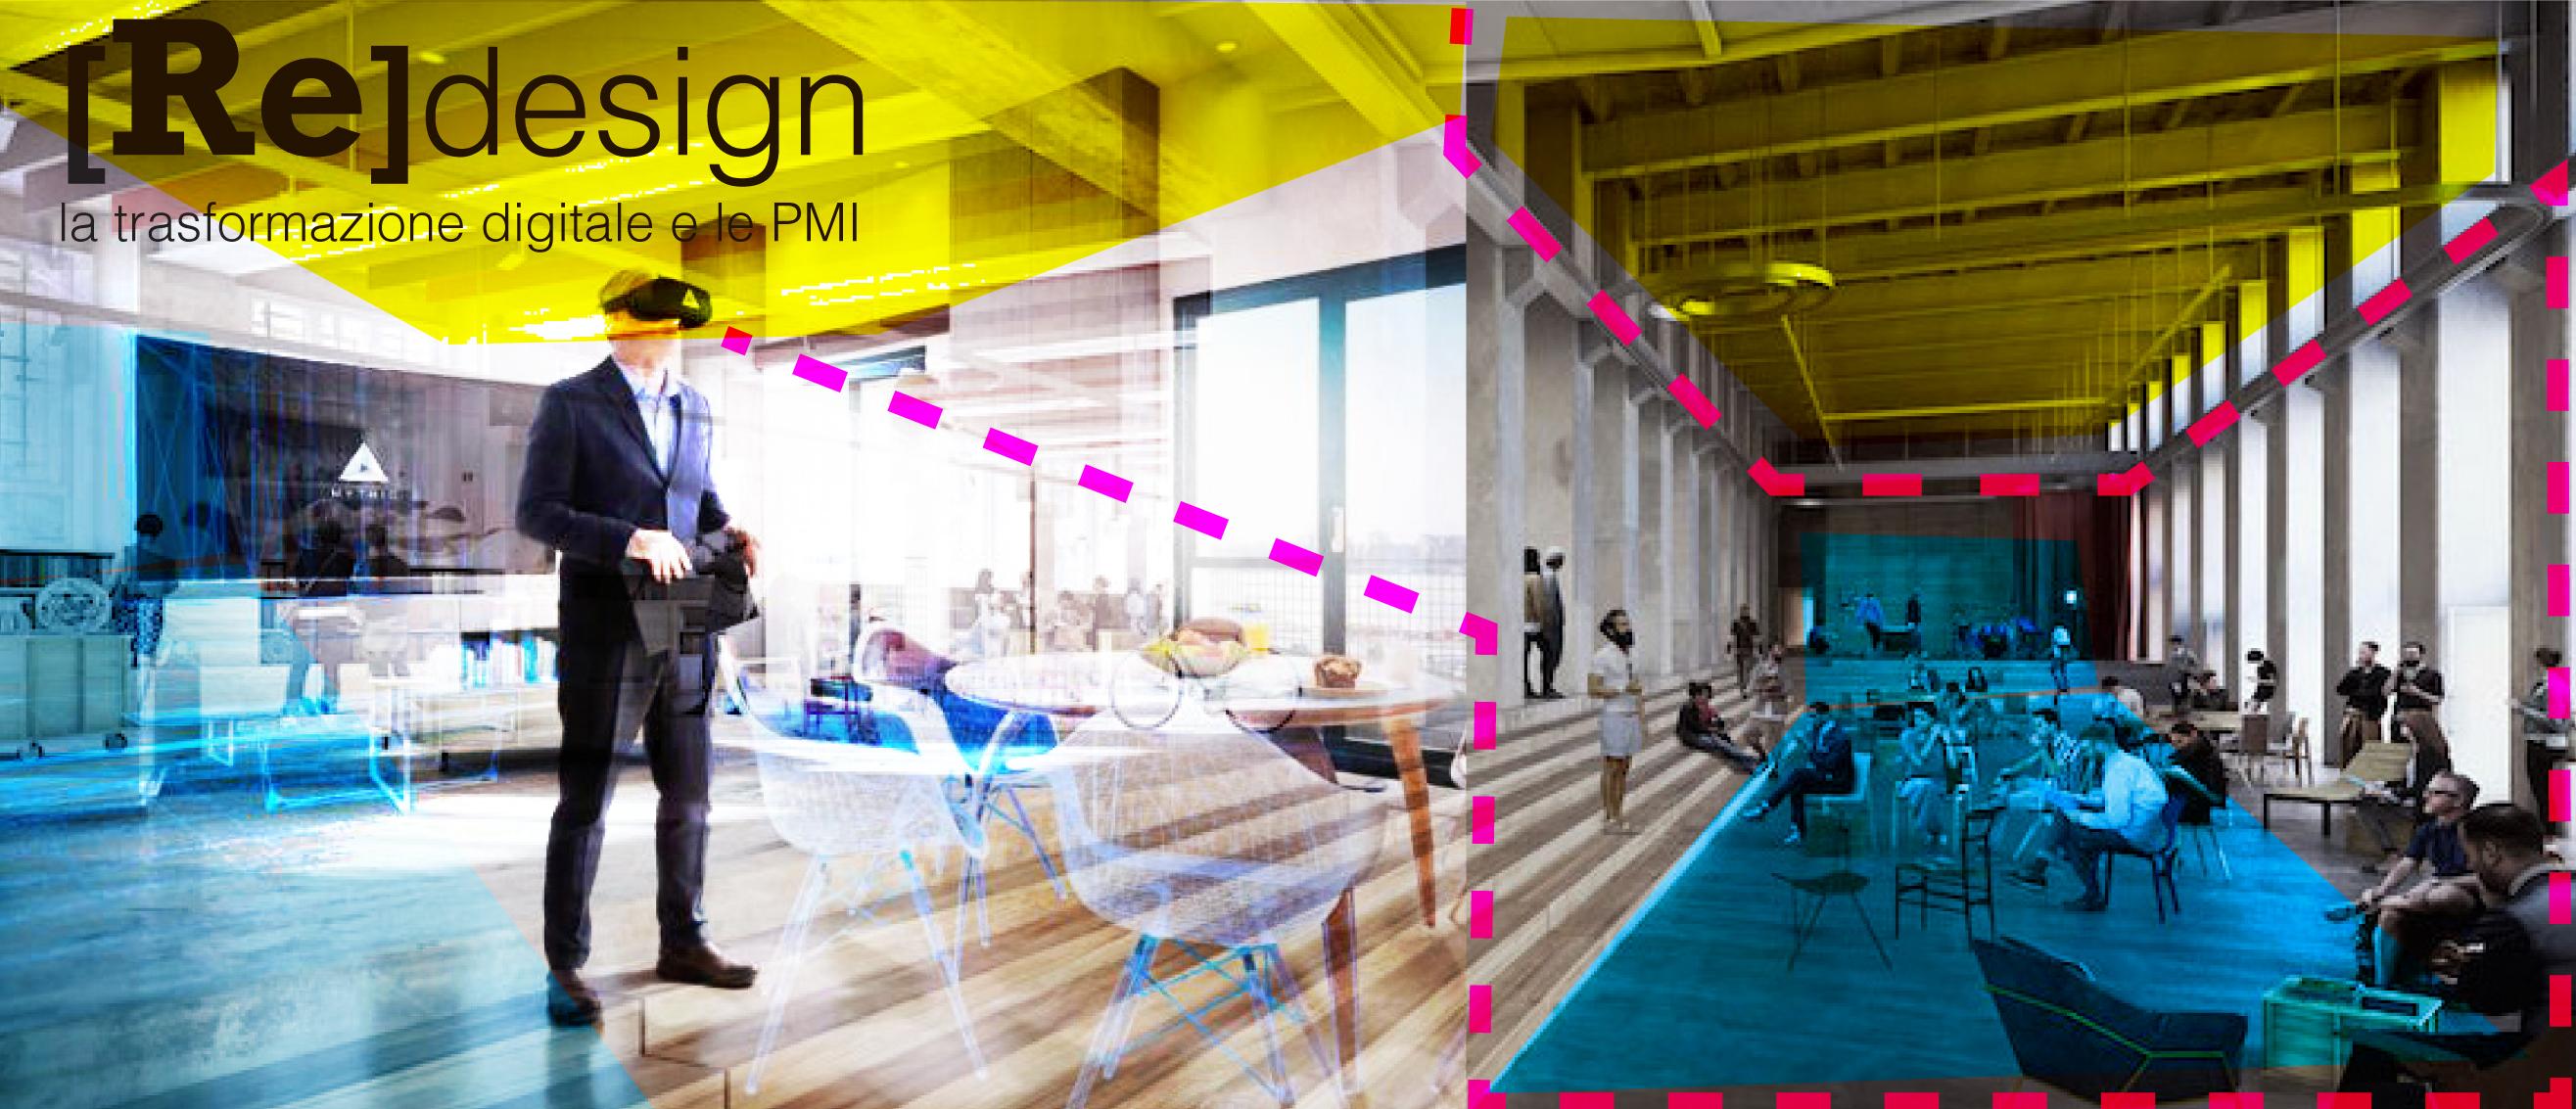 re_design_imamgine1